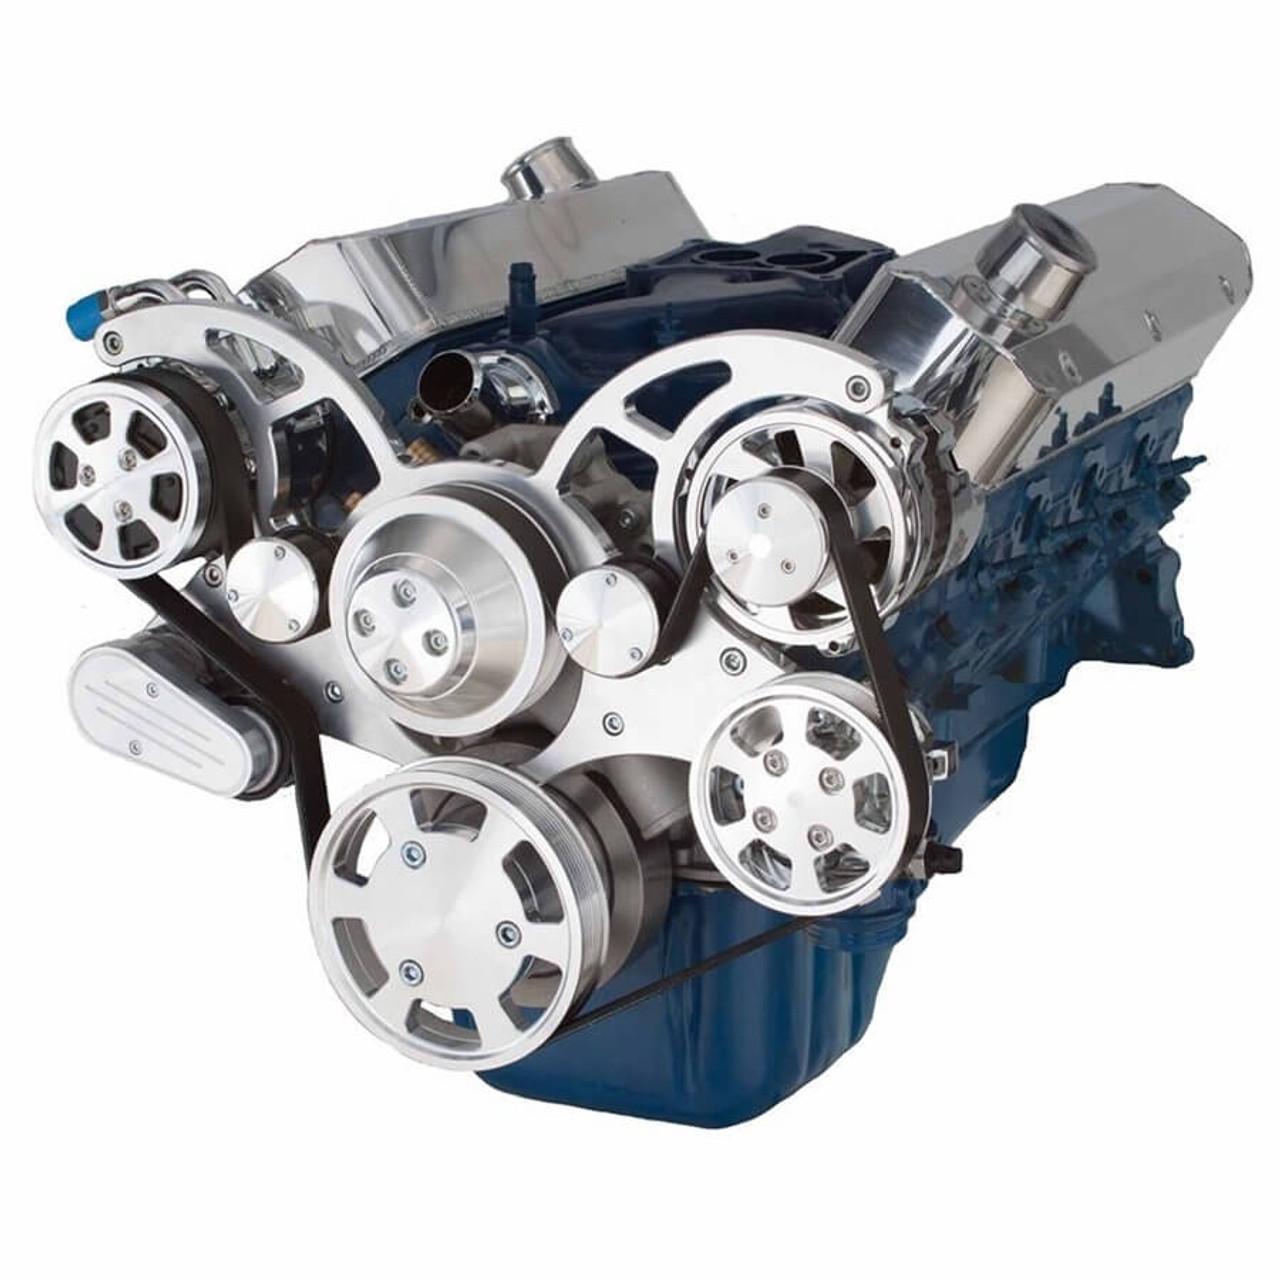 Serpentine System for 351C, 351M & 400 - AC, Power Steering & Alternator